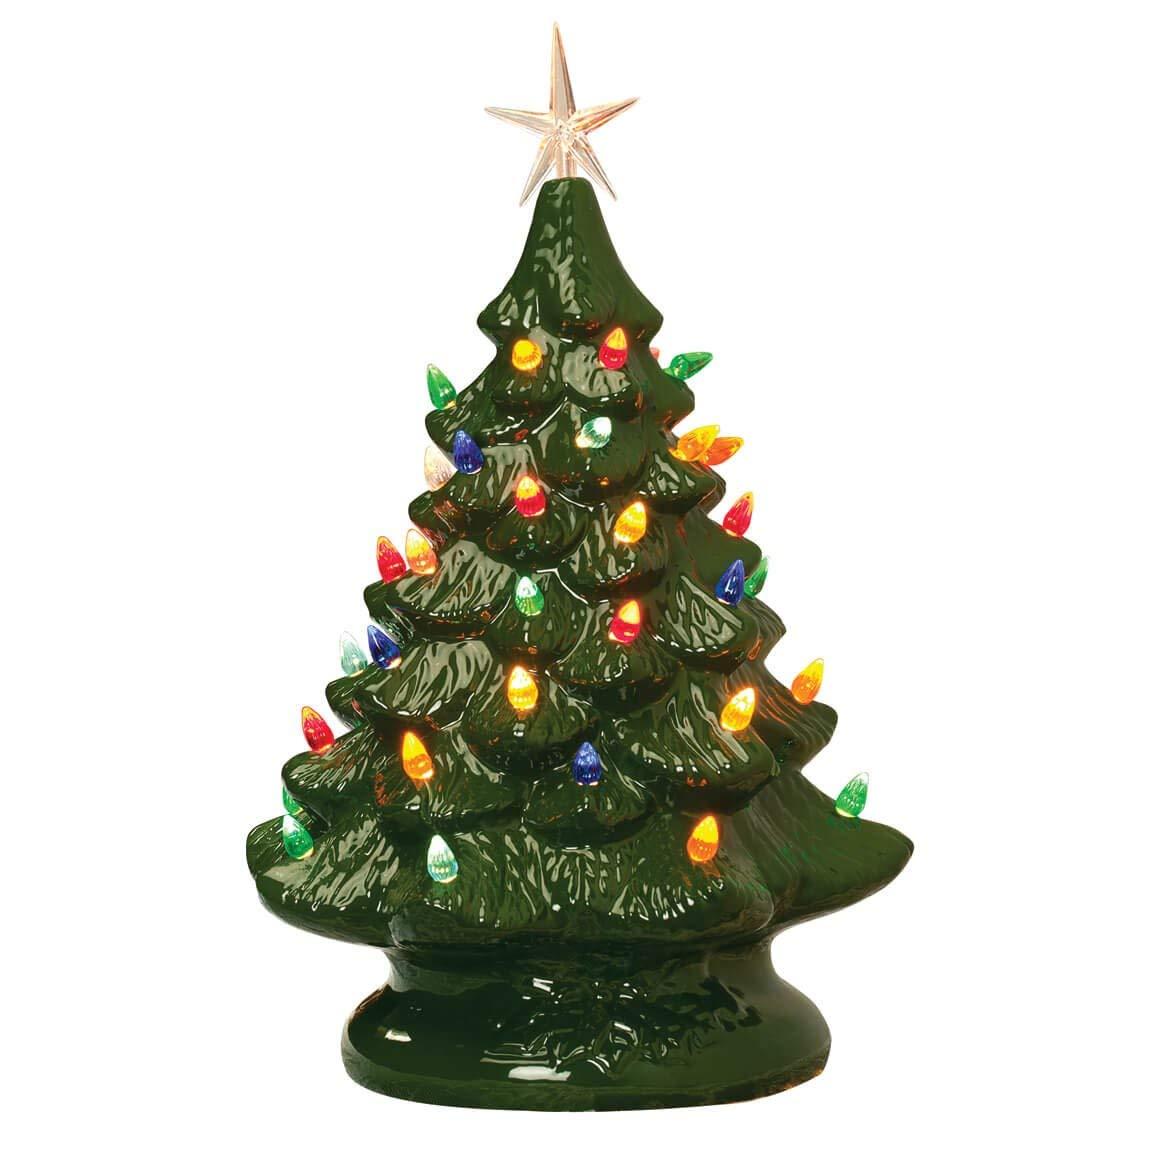 14 Retro Prelit Ceramic Tabletop Christmas Tree With 52 Multicolored Lights Green